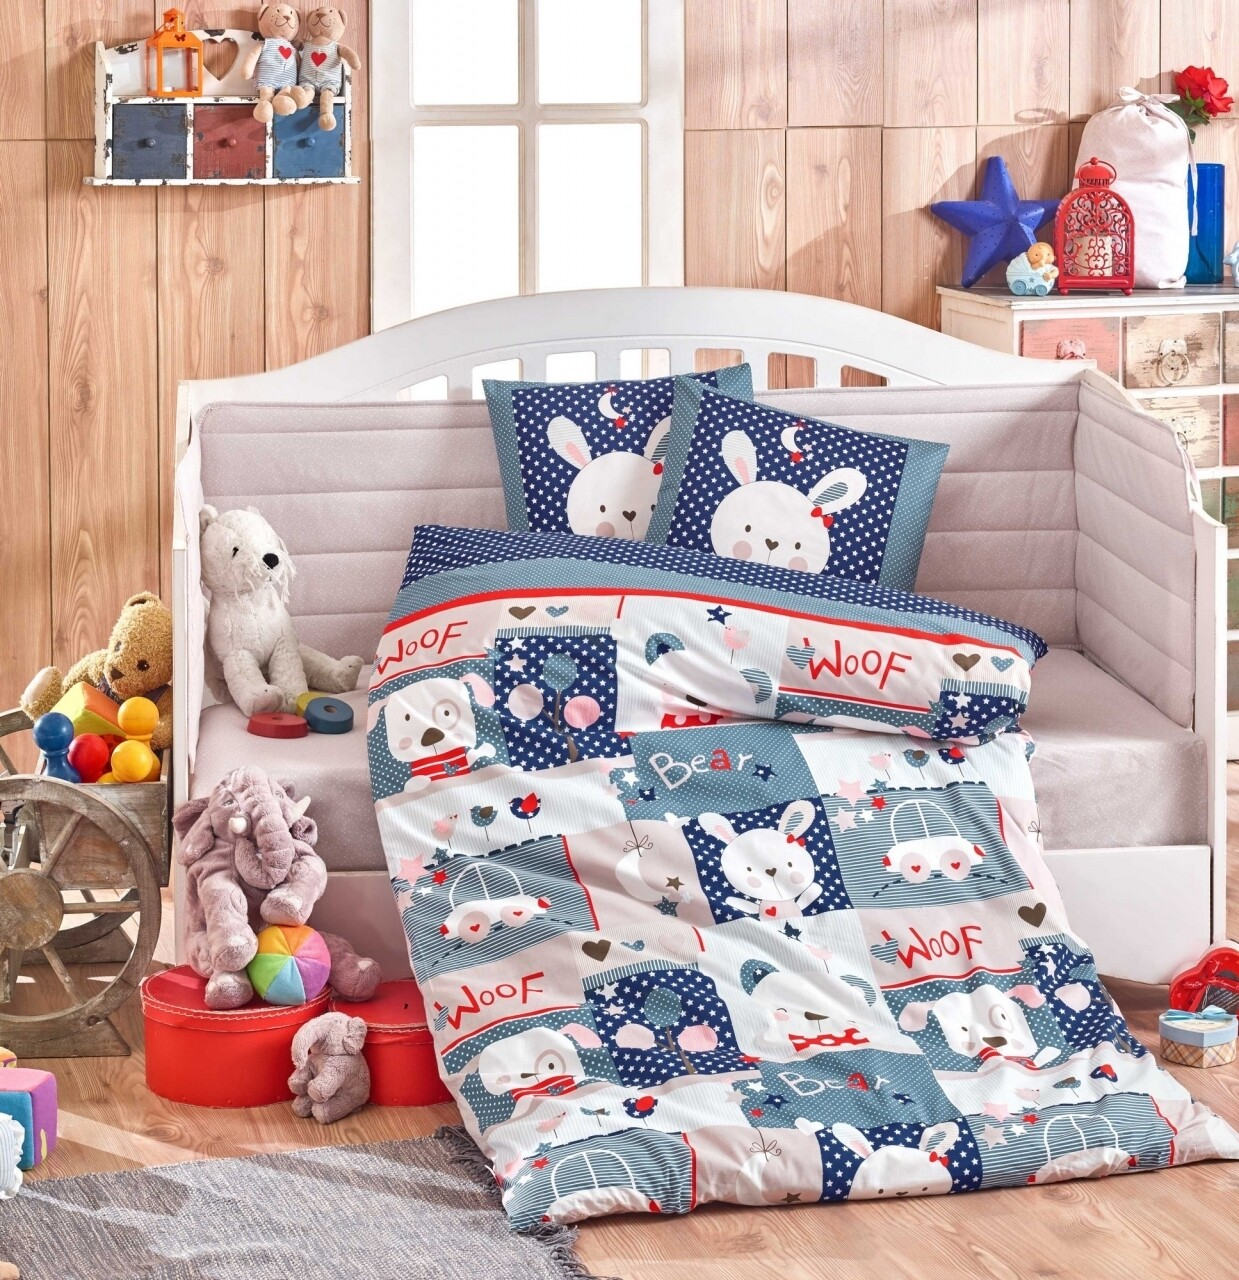 Lenjerie de pat pentru copii, 4 piese, 100% bumbac poplin, Hobby, Snoopy, bleumarin